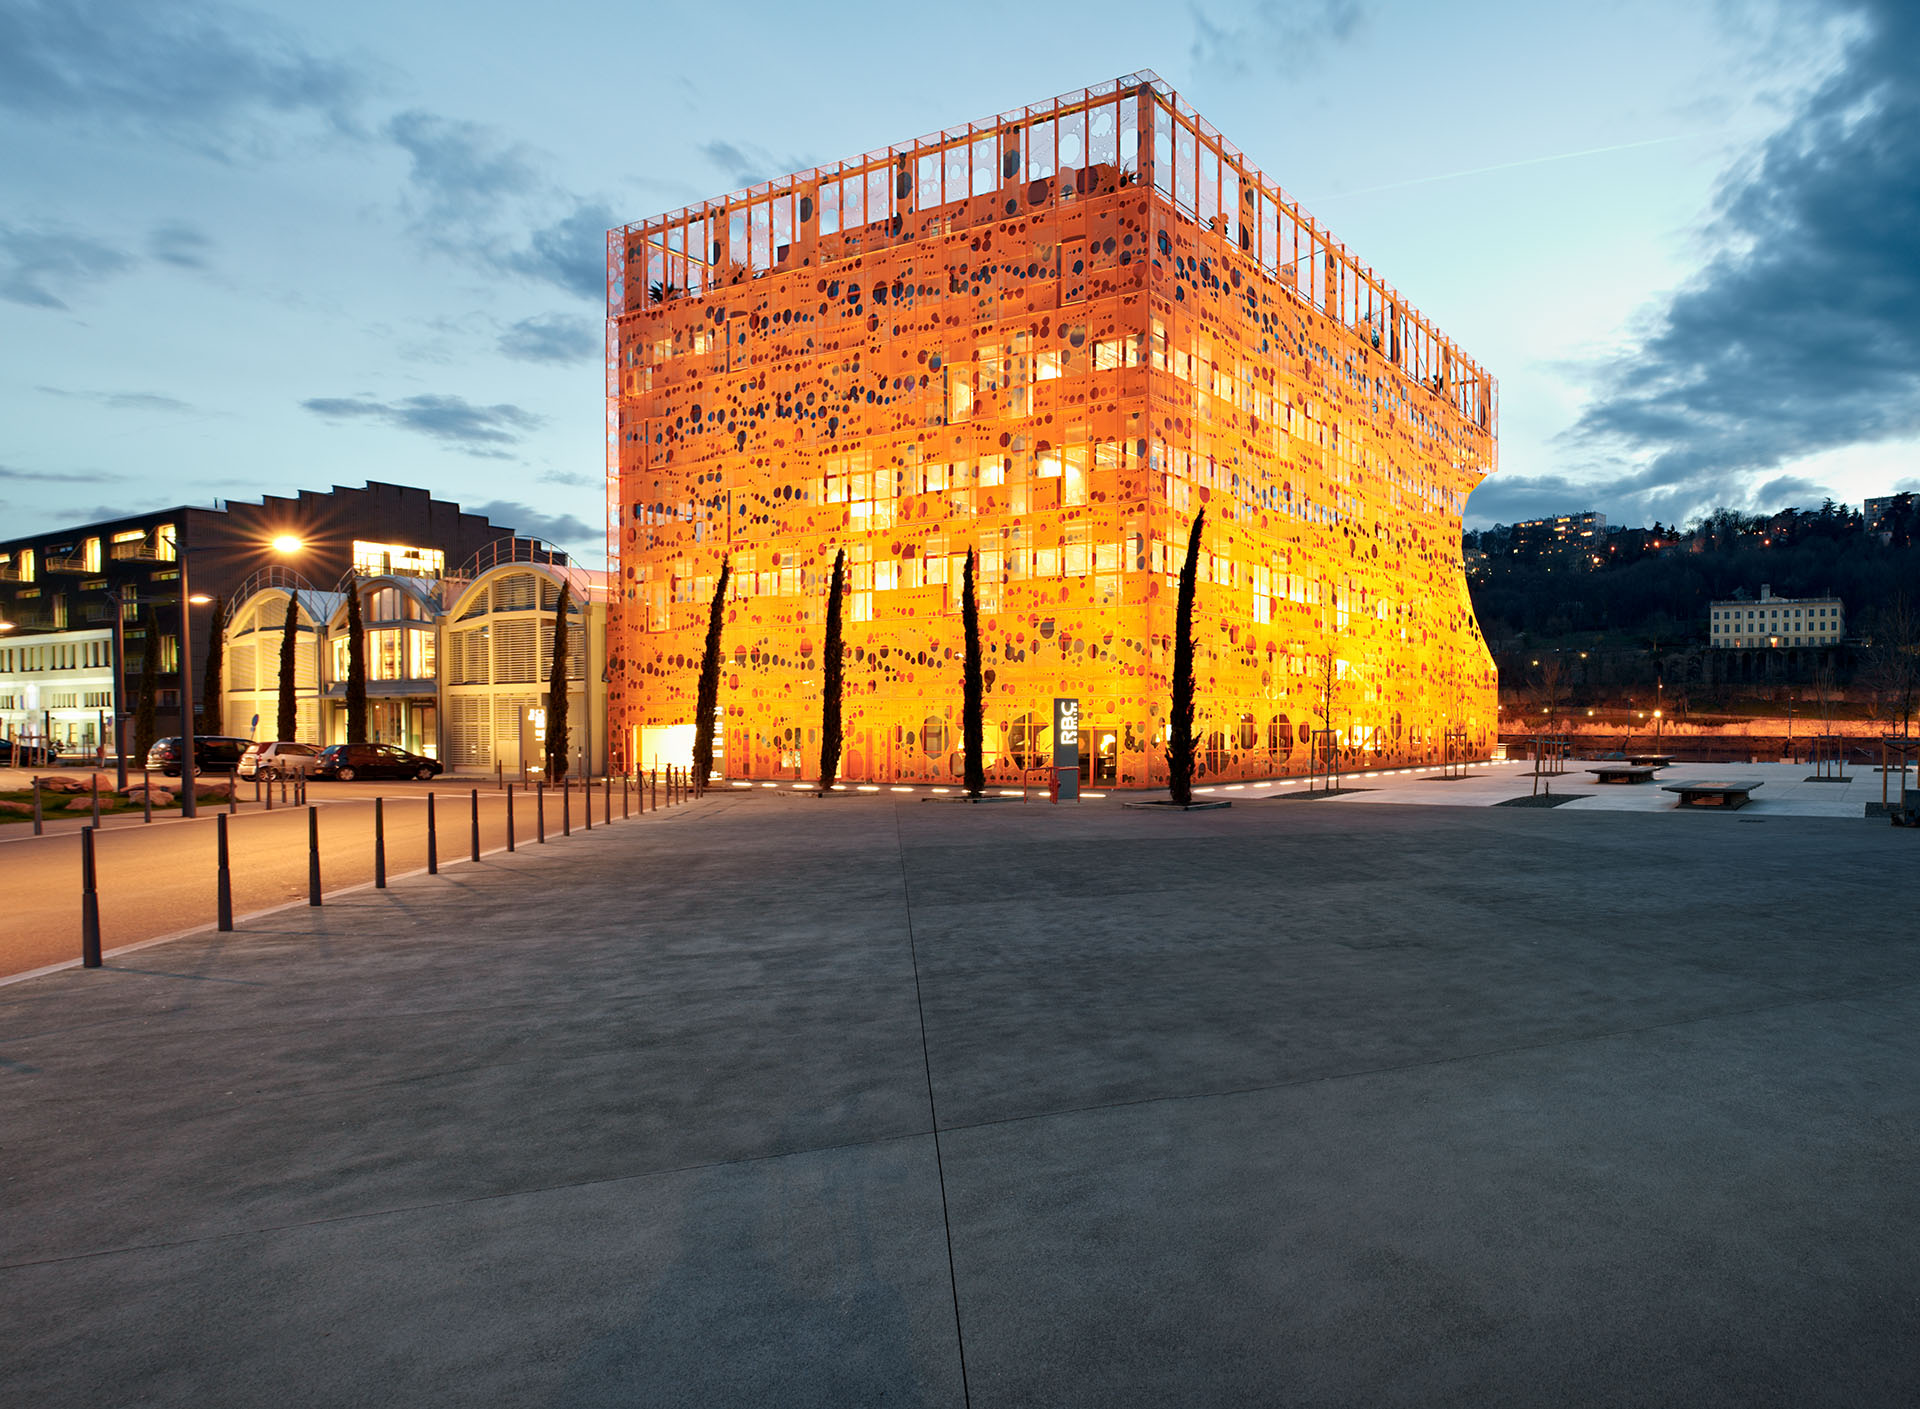 Les Salins du Midi - Architectes Jakob & MacFarlane - 2011